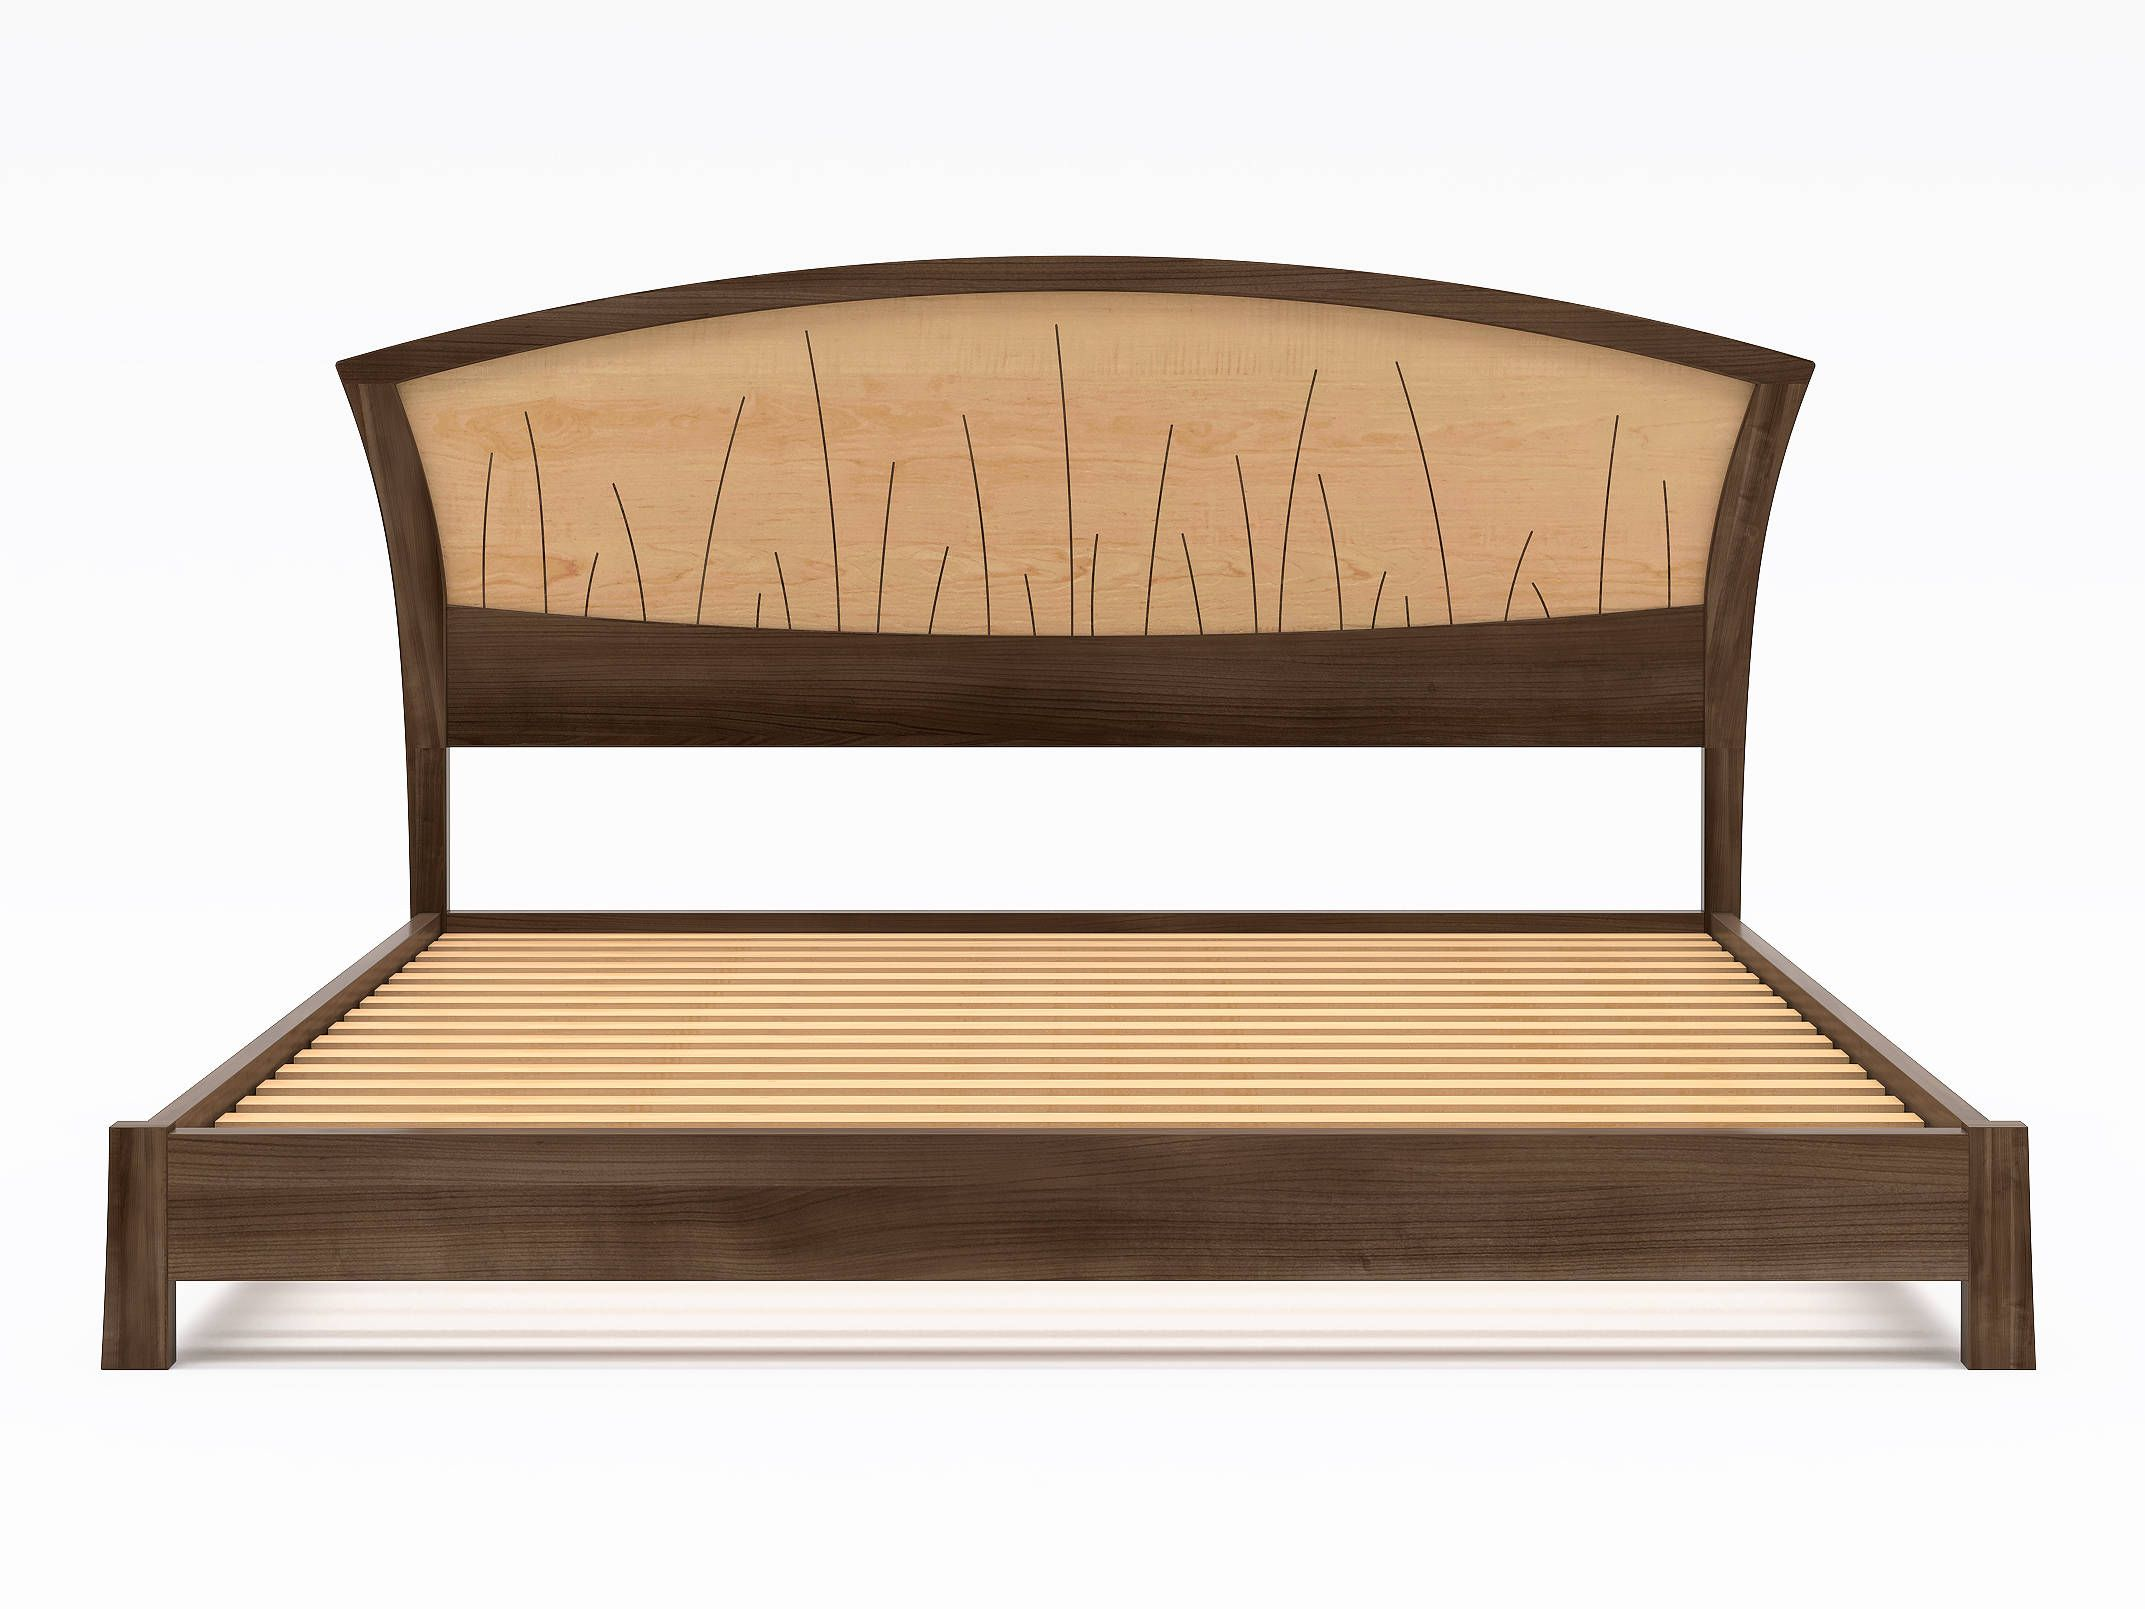 Walnut Platform Bed Queen Size, Low Modern Bed Frame Wood